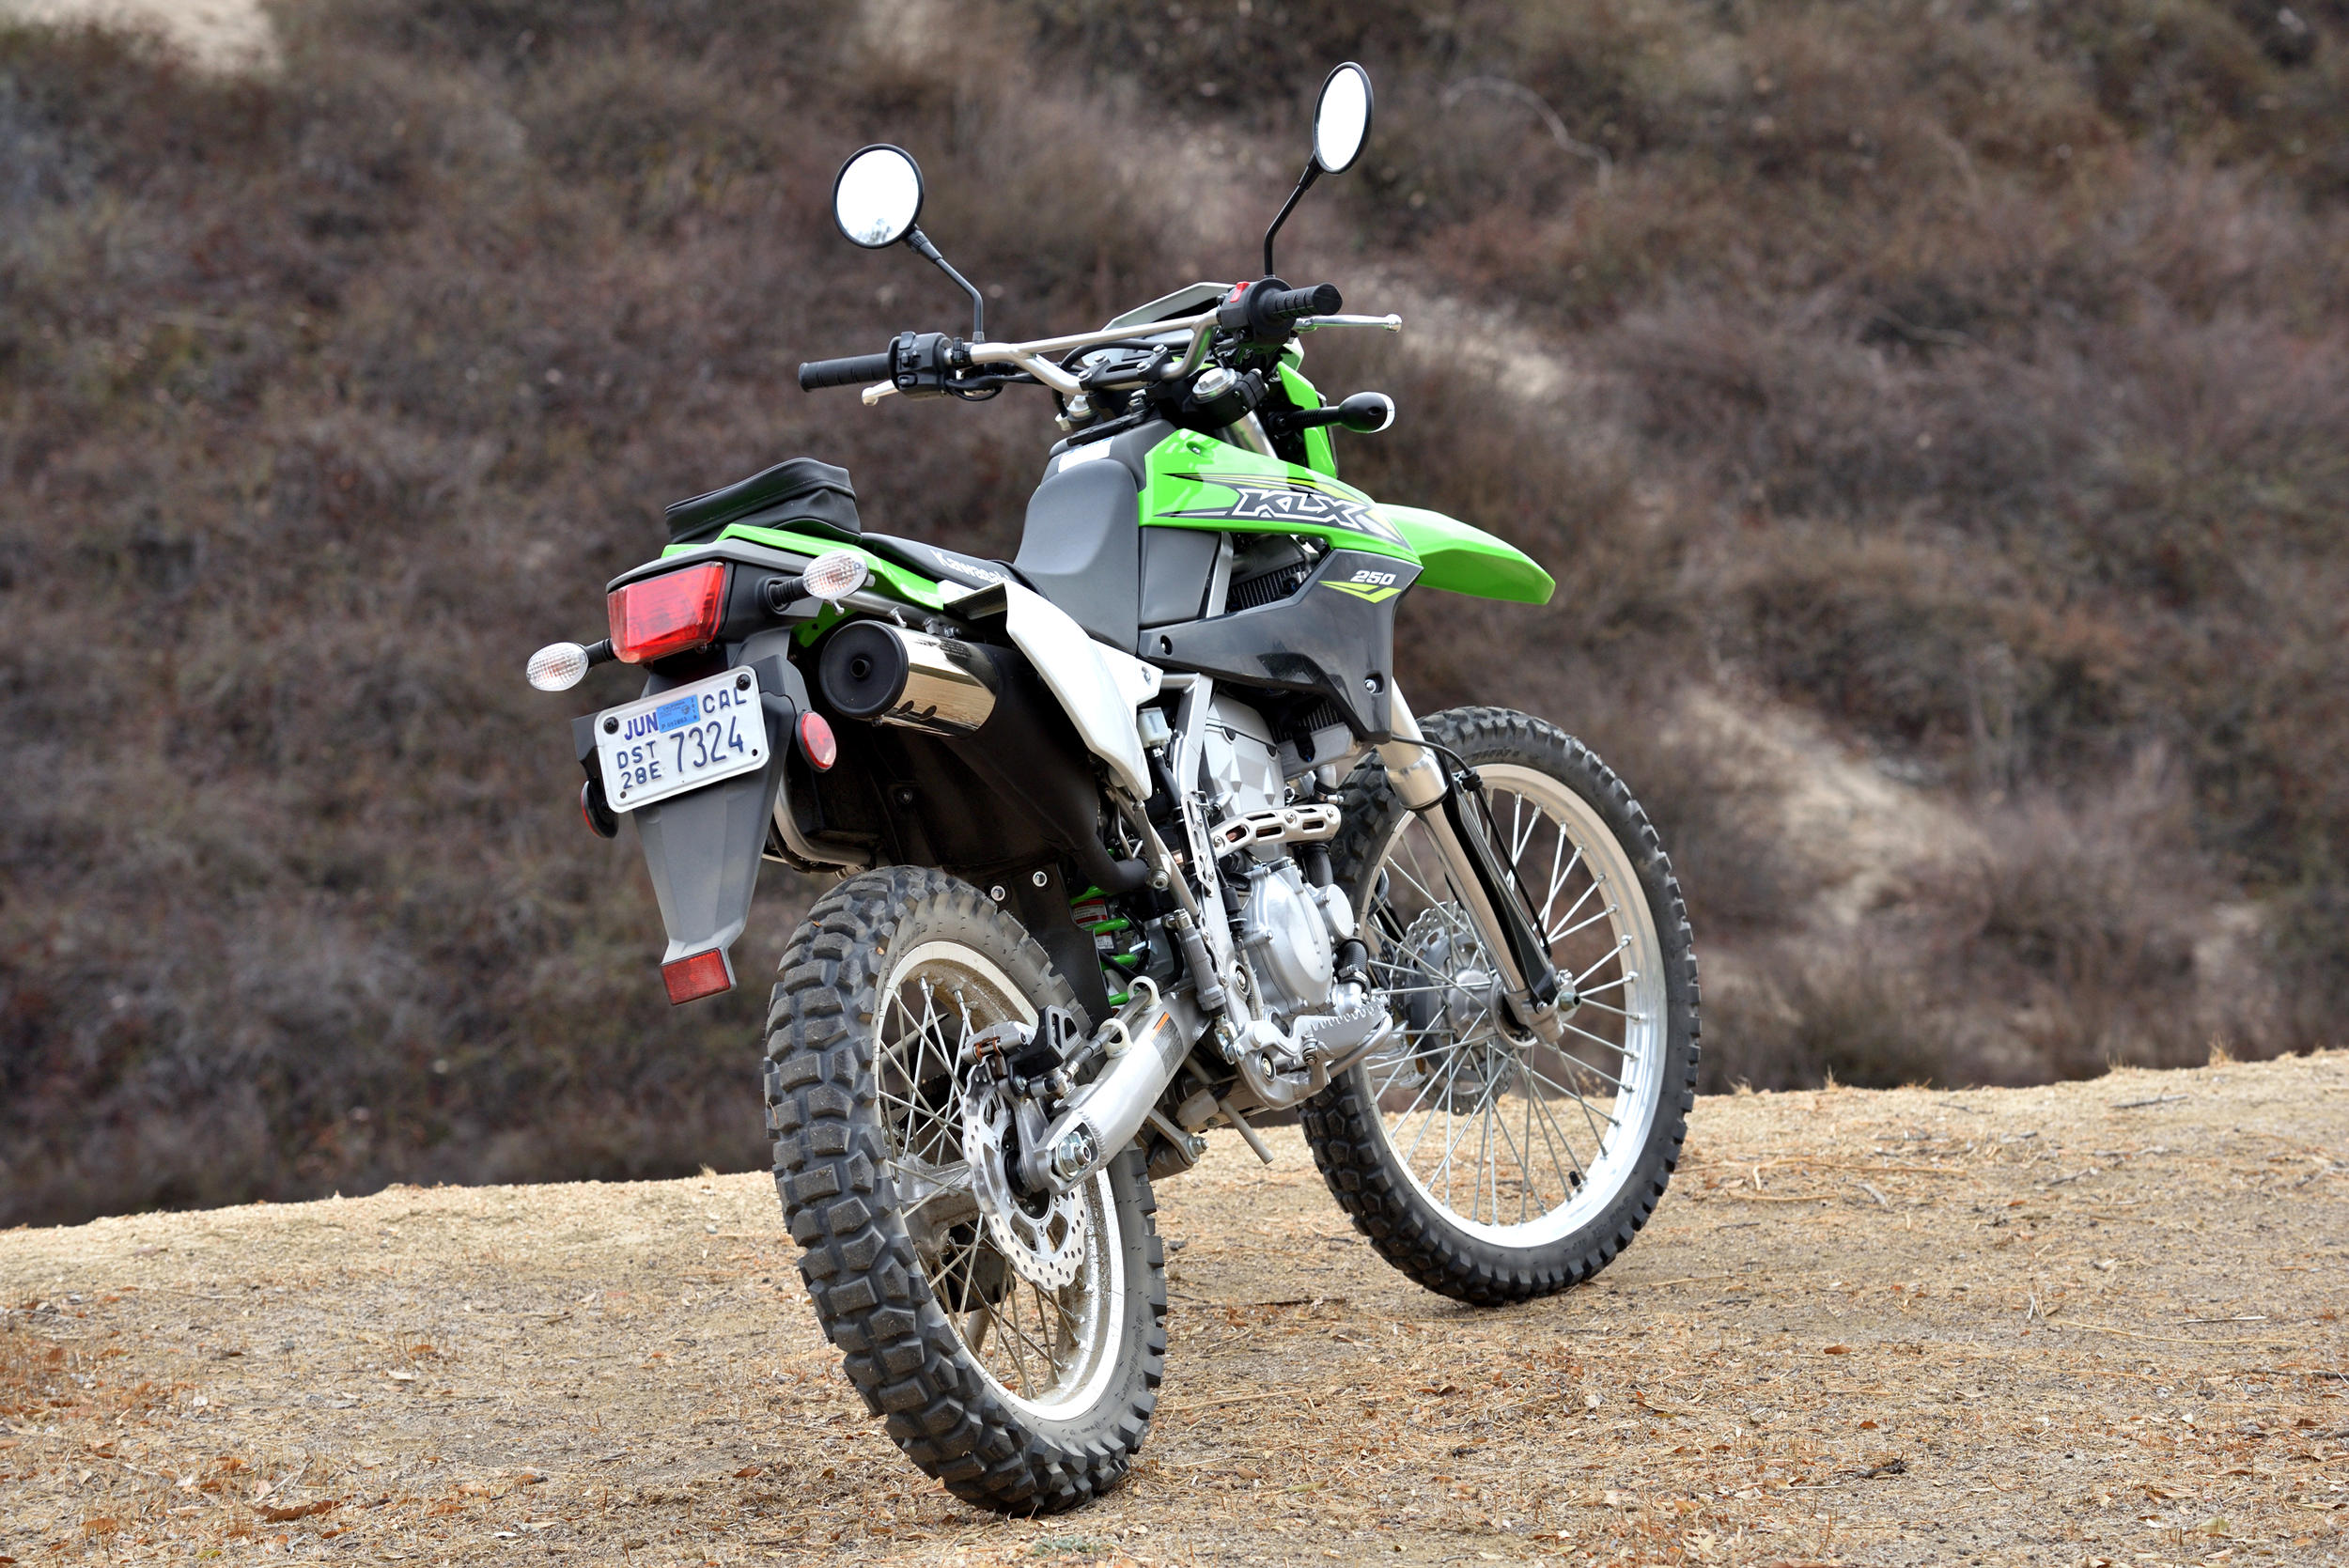 2018 Kawasaki KLX250: MD Ride Review - MotorcycleDaily com